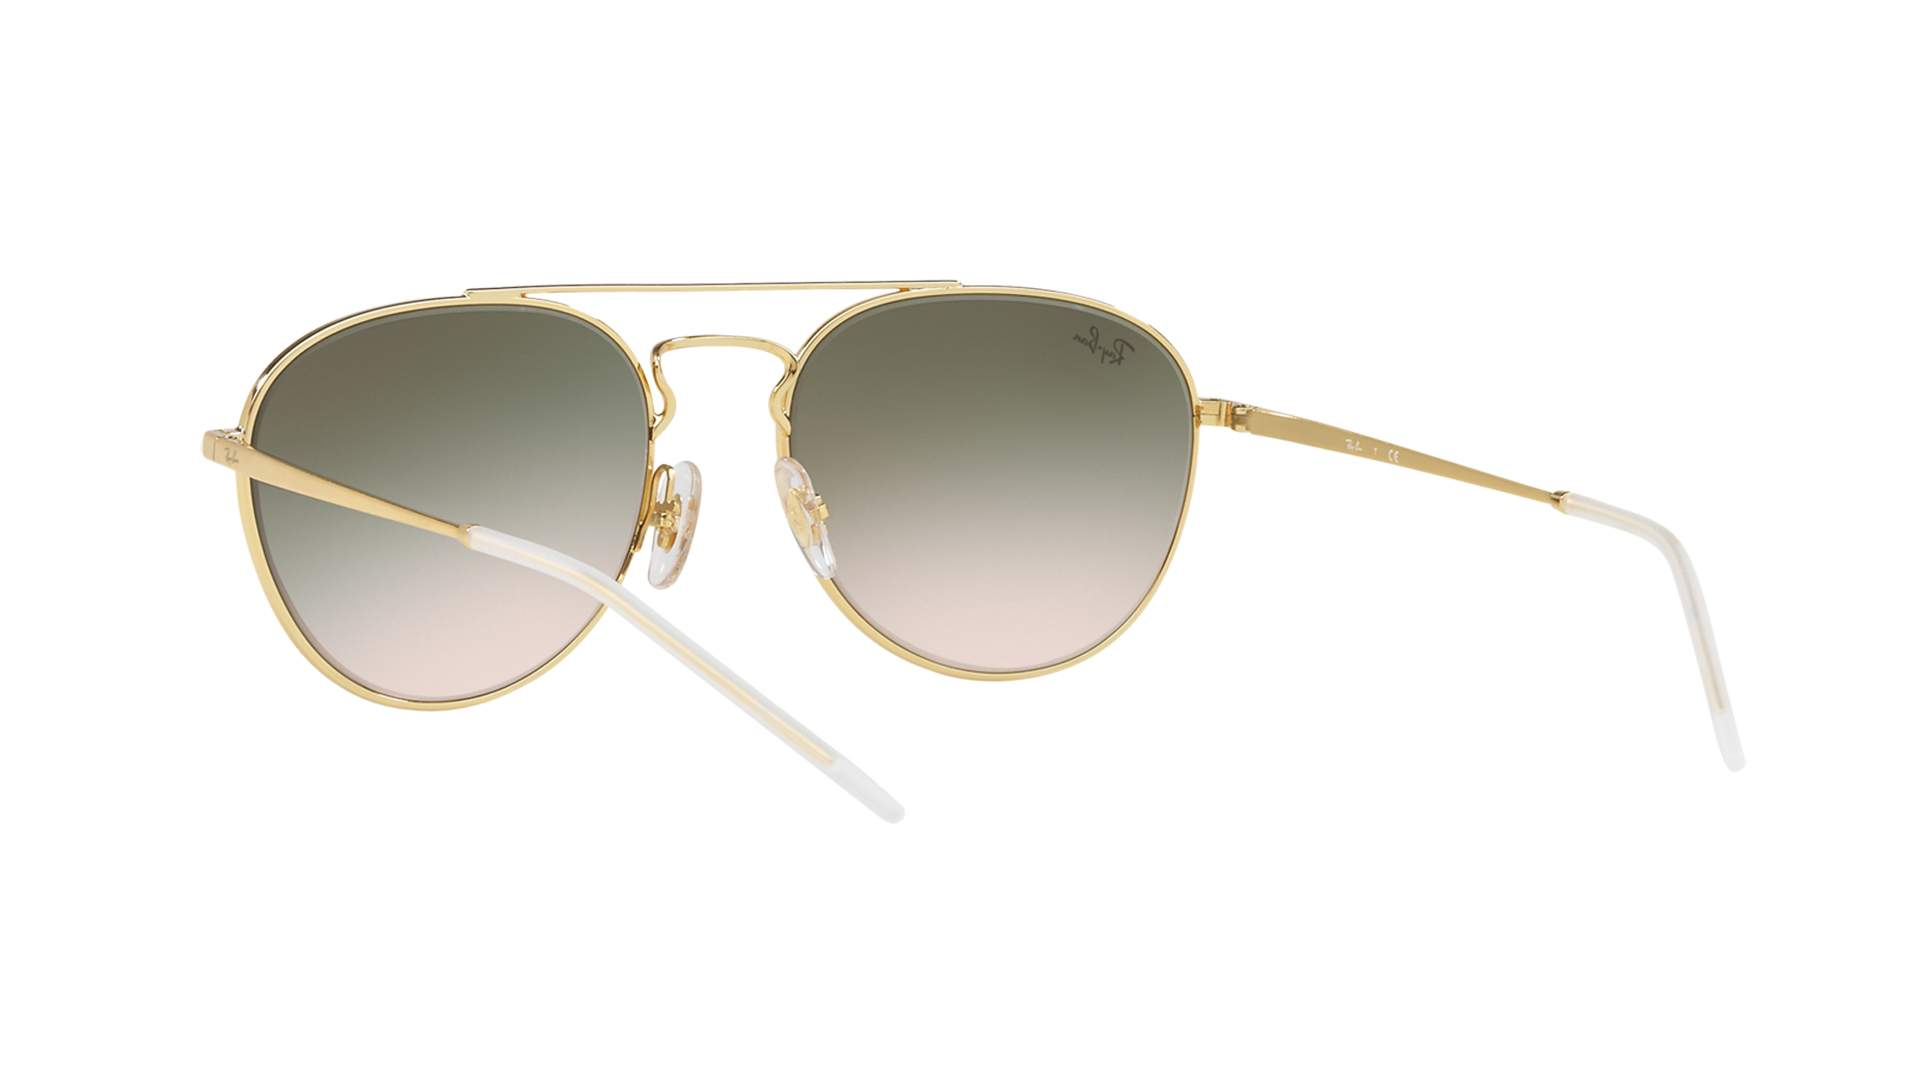 4f75d38c9f Sunglasses Ray-Ban RB3589 9058 2C 55-18 Yellow Medium Gradient